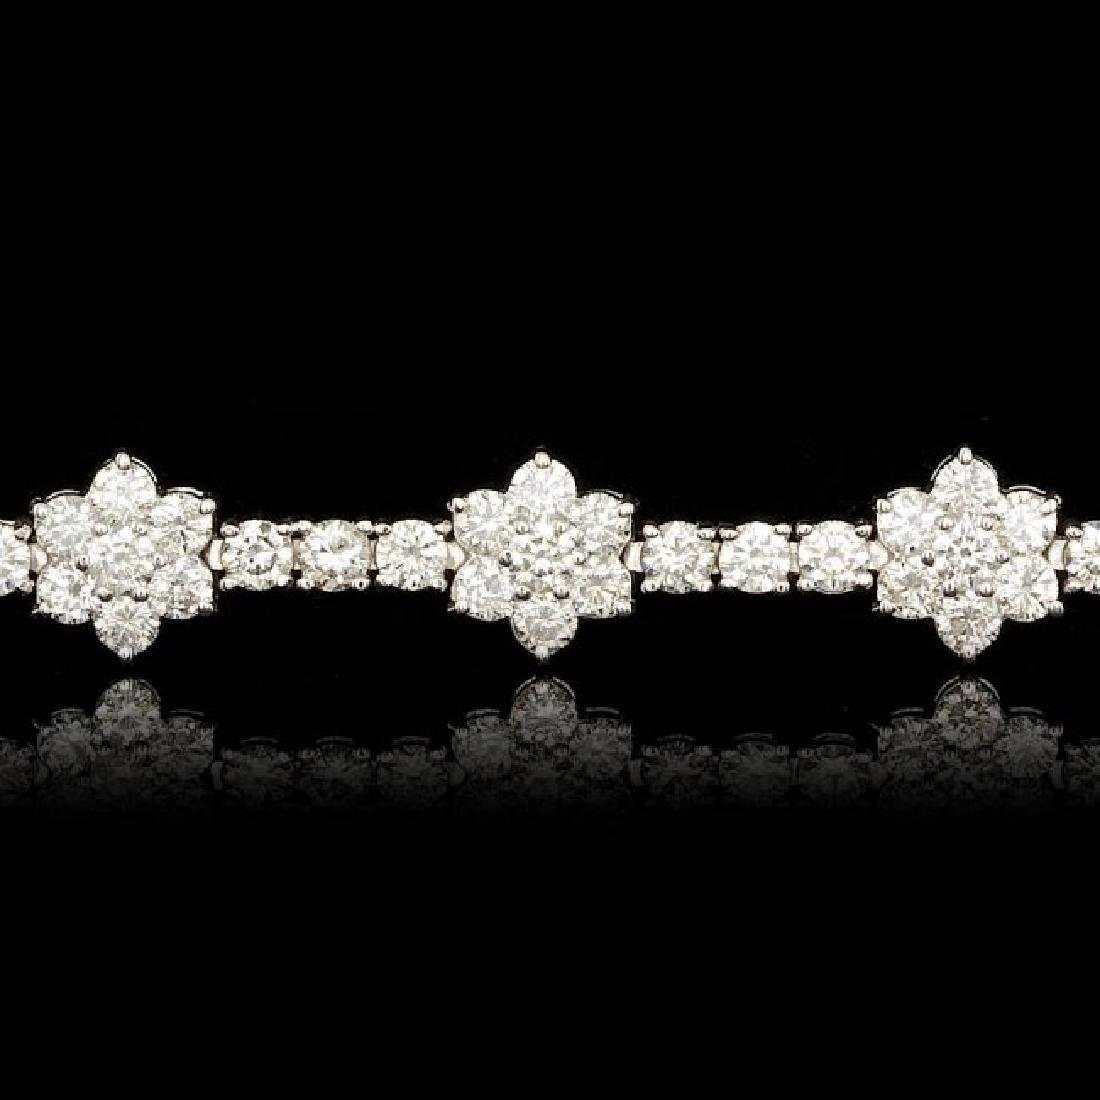 18k White Gold 6.80ct Diamond Bracelet - 4